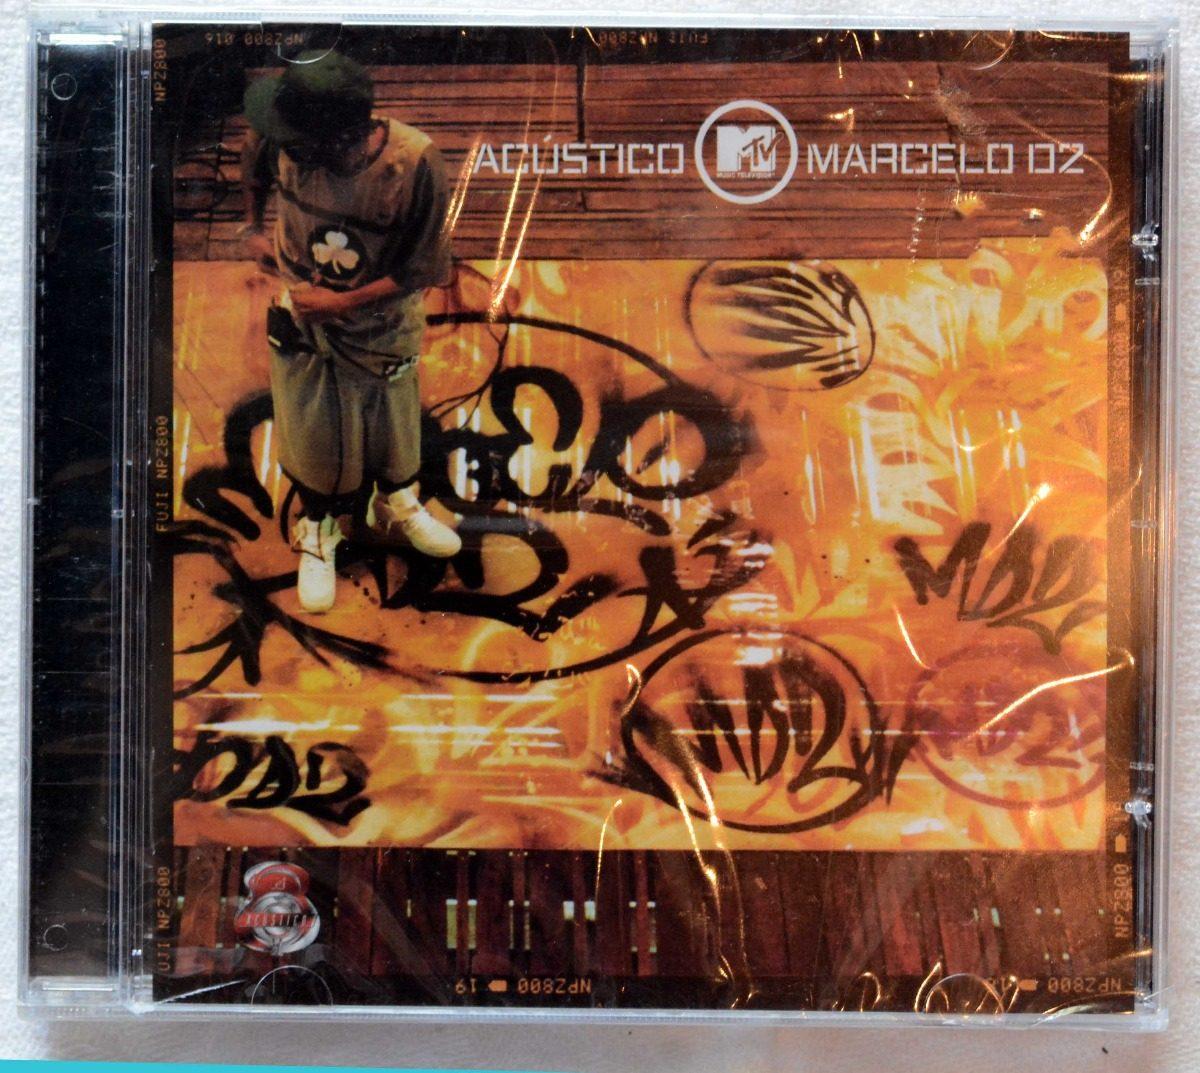 cd completo marcelo d2 acustico mtv gratis